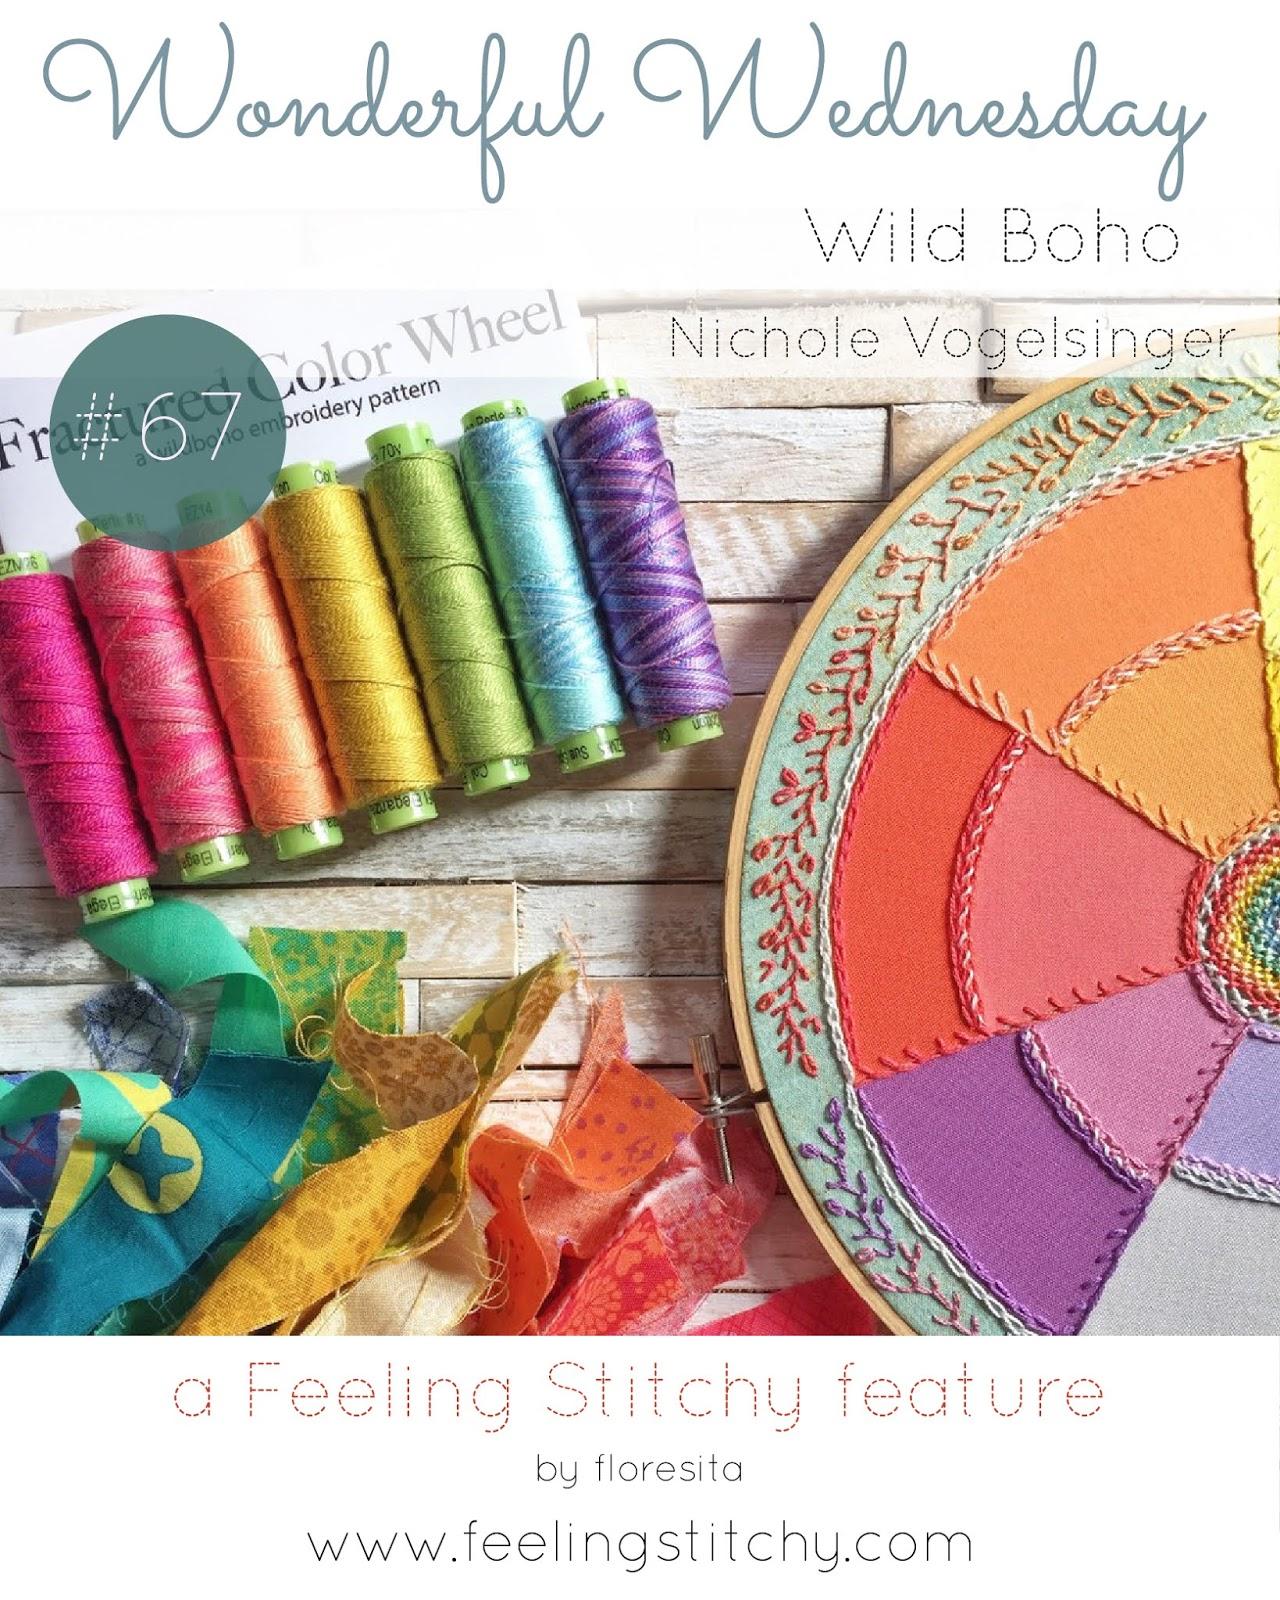 Wonderful Wednesday 67 Wild Boho Nichole Vogelsinger as featured by floresita on Feeling Stitchy